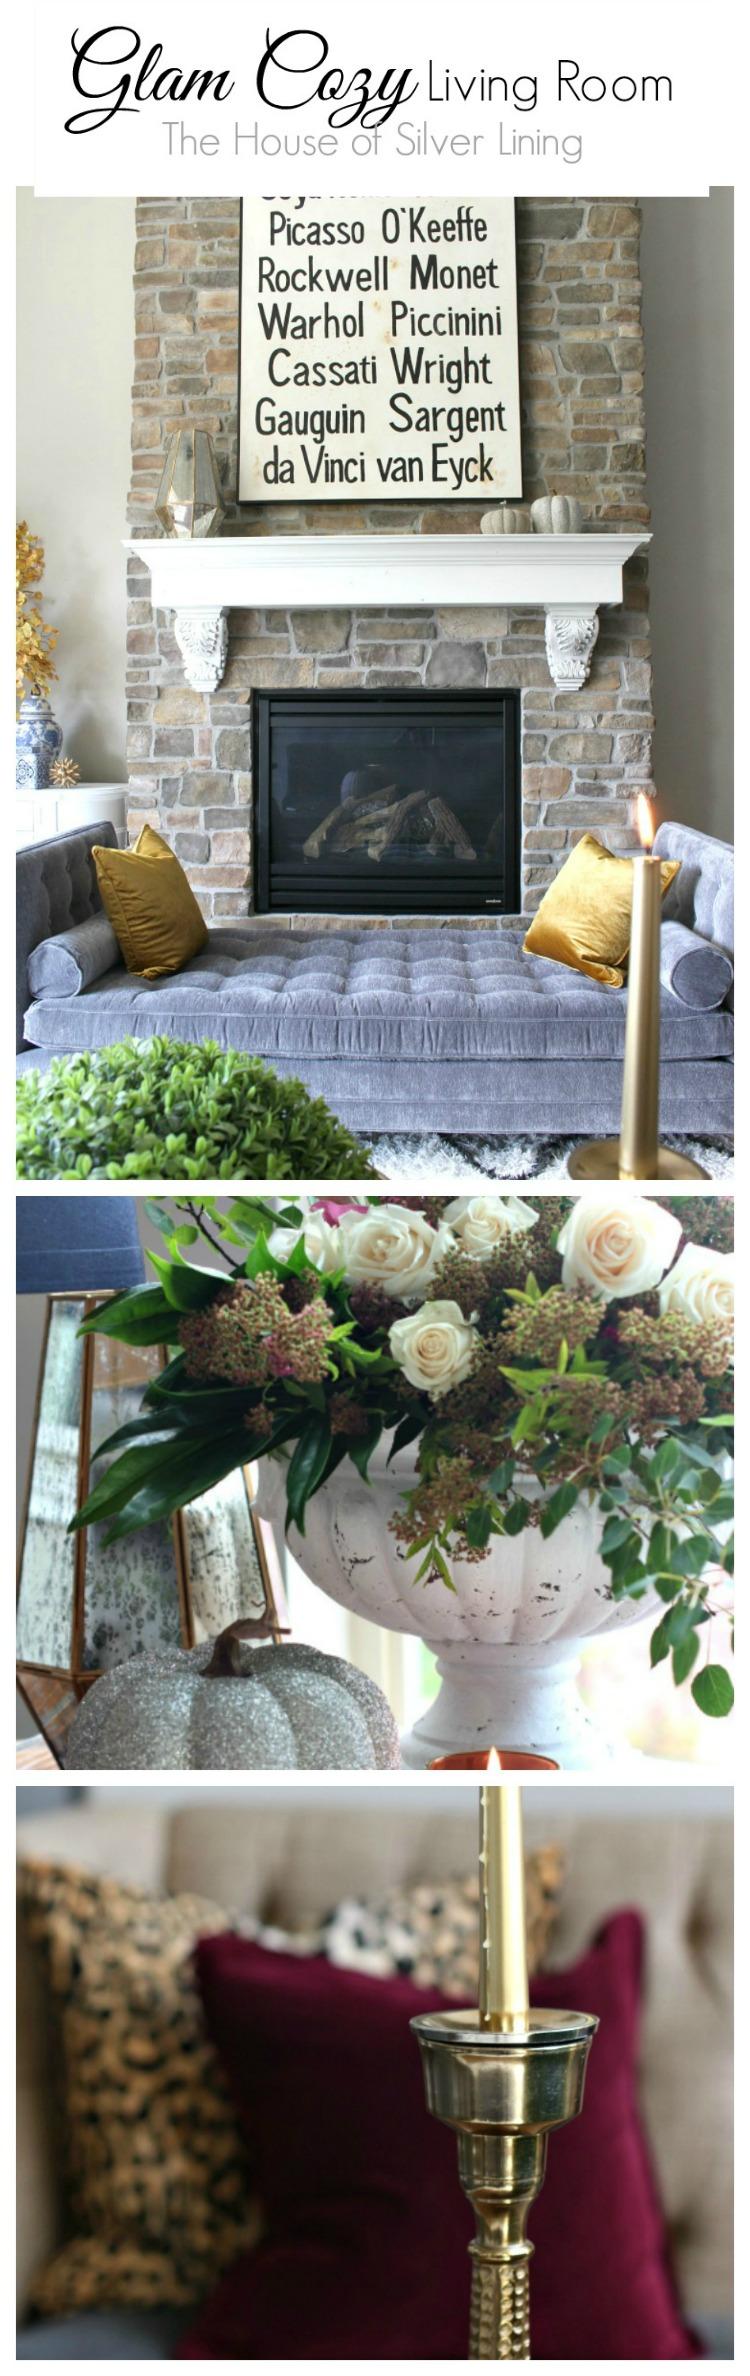 glam-cozy-living-room